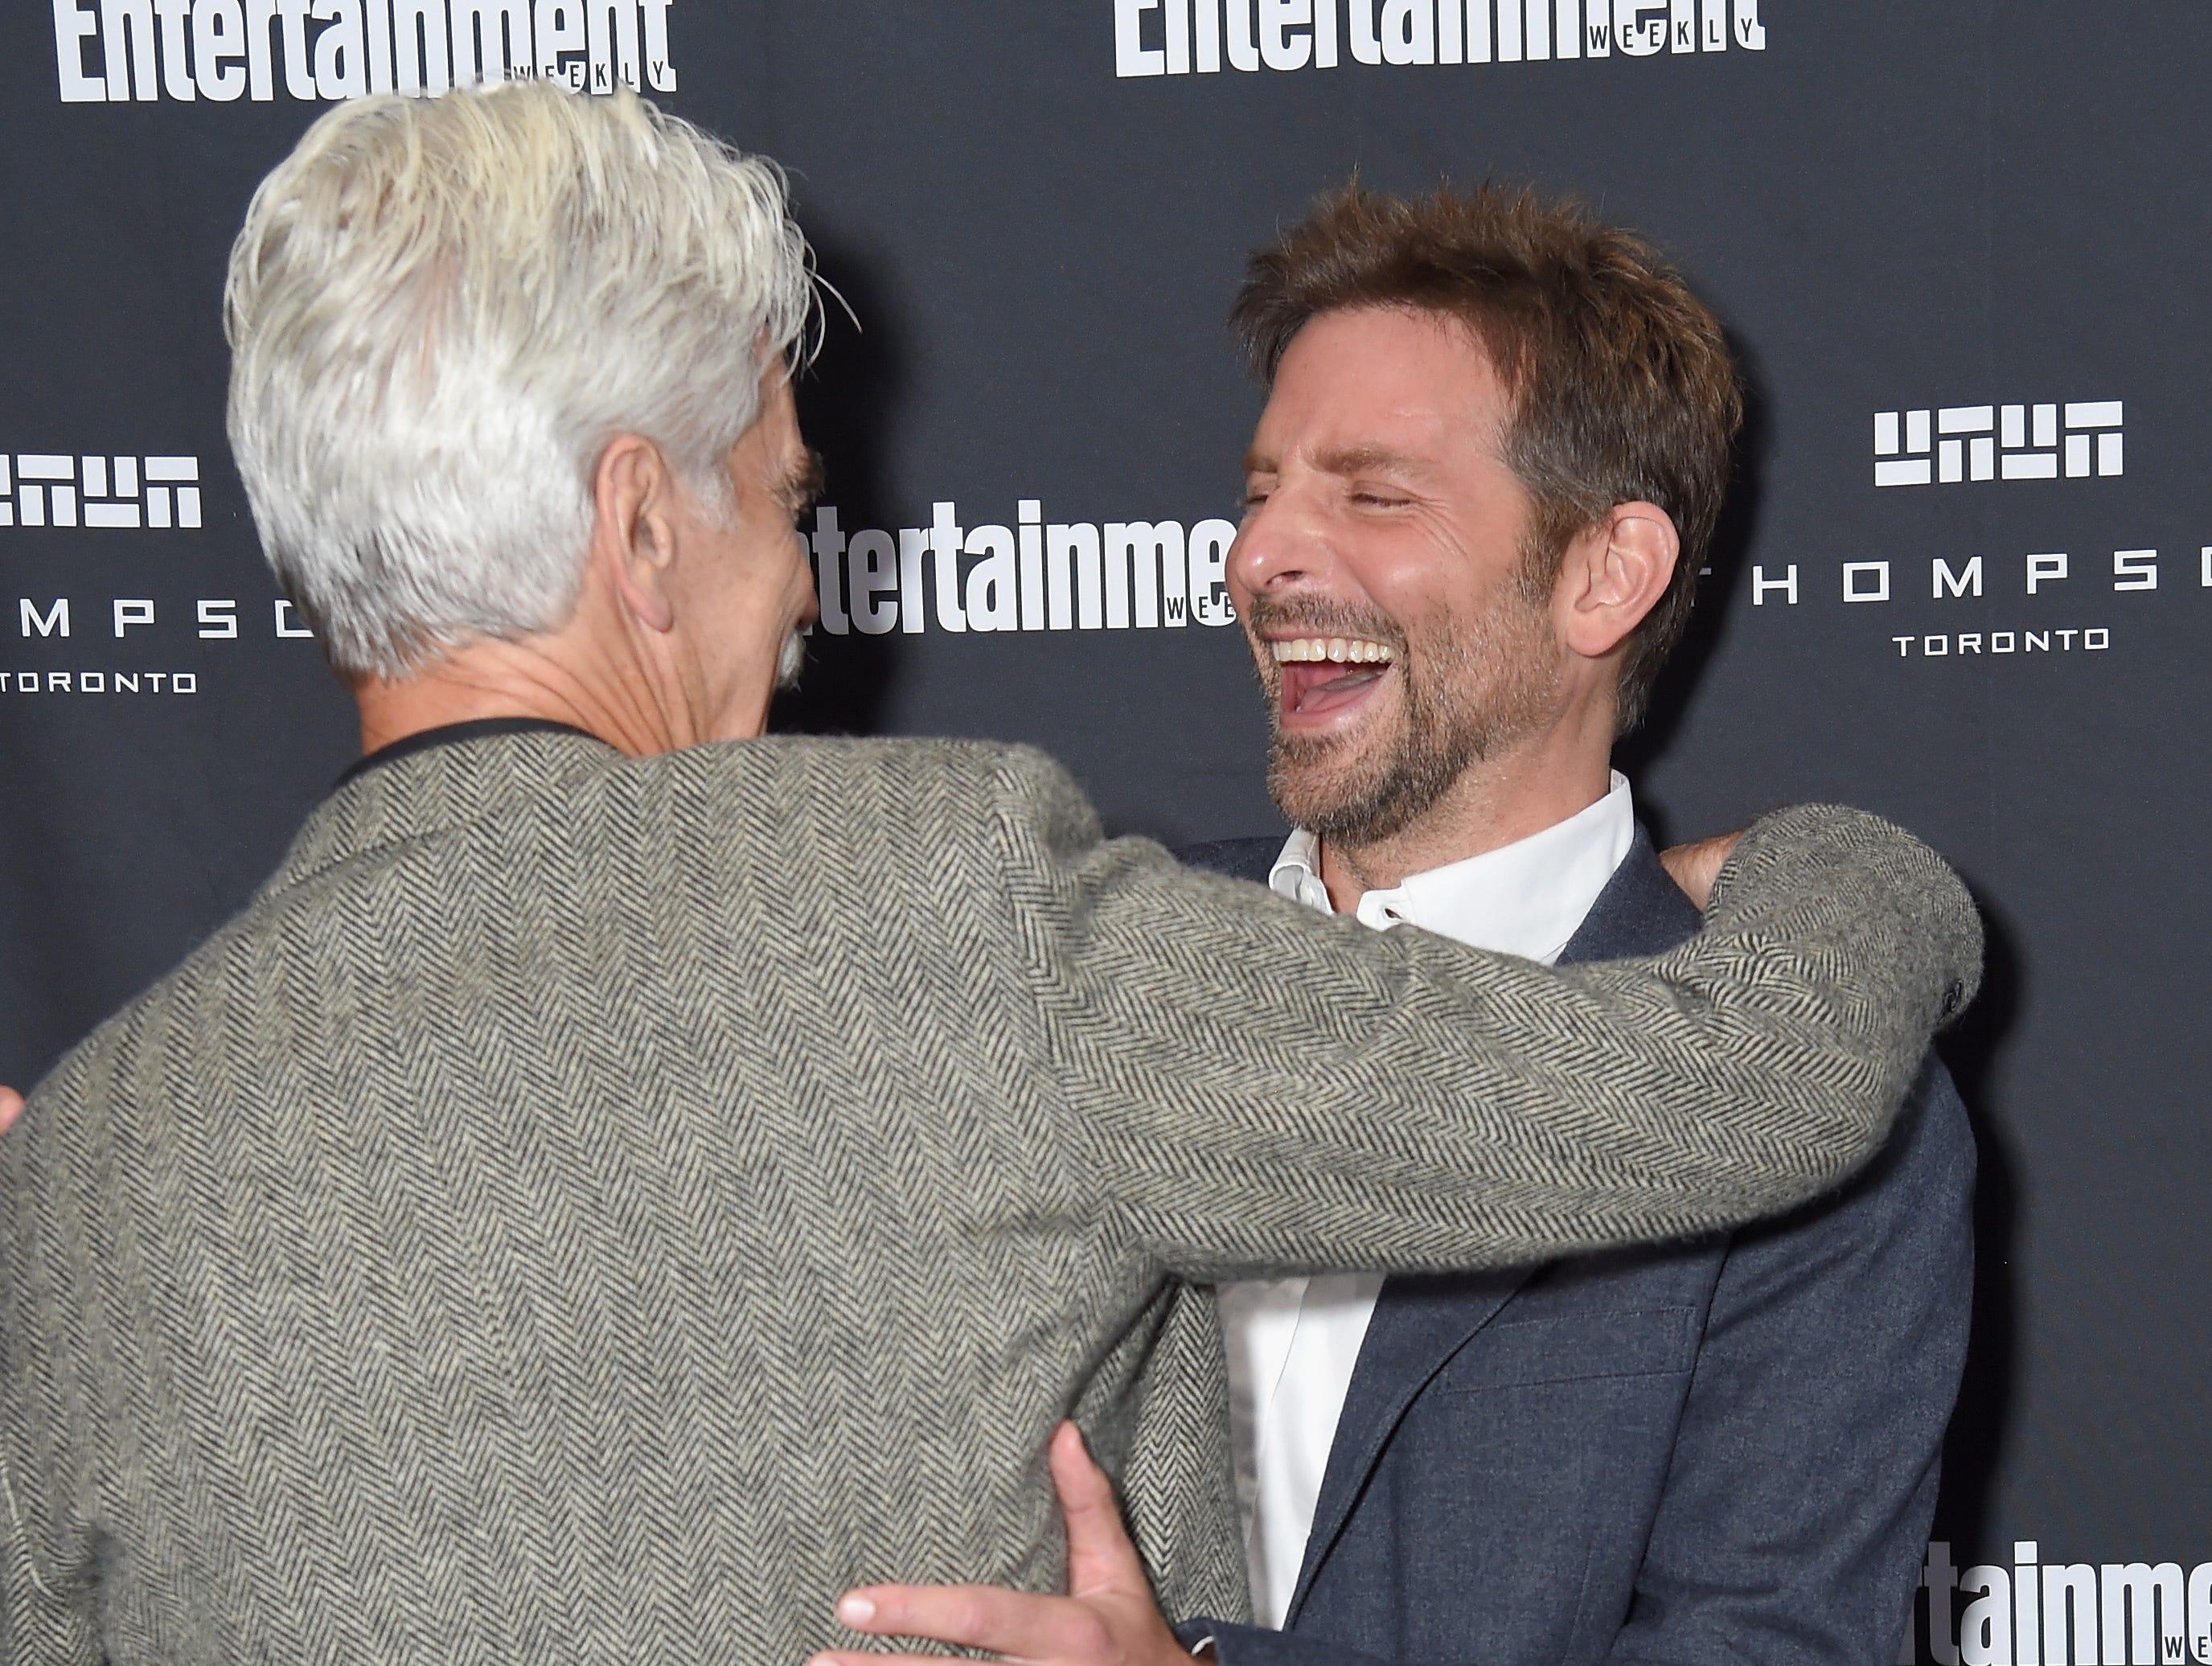 'A Star is Born': Bradley Cooper's deep Sam Elliott-inspired voice impressed even Elliott